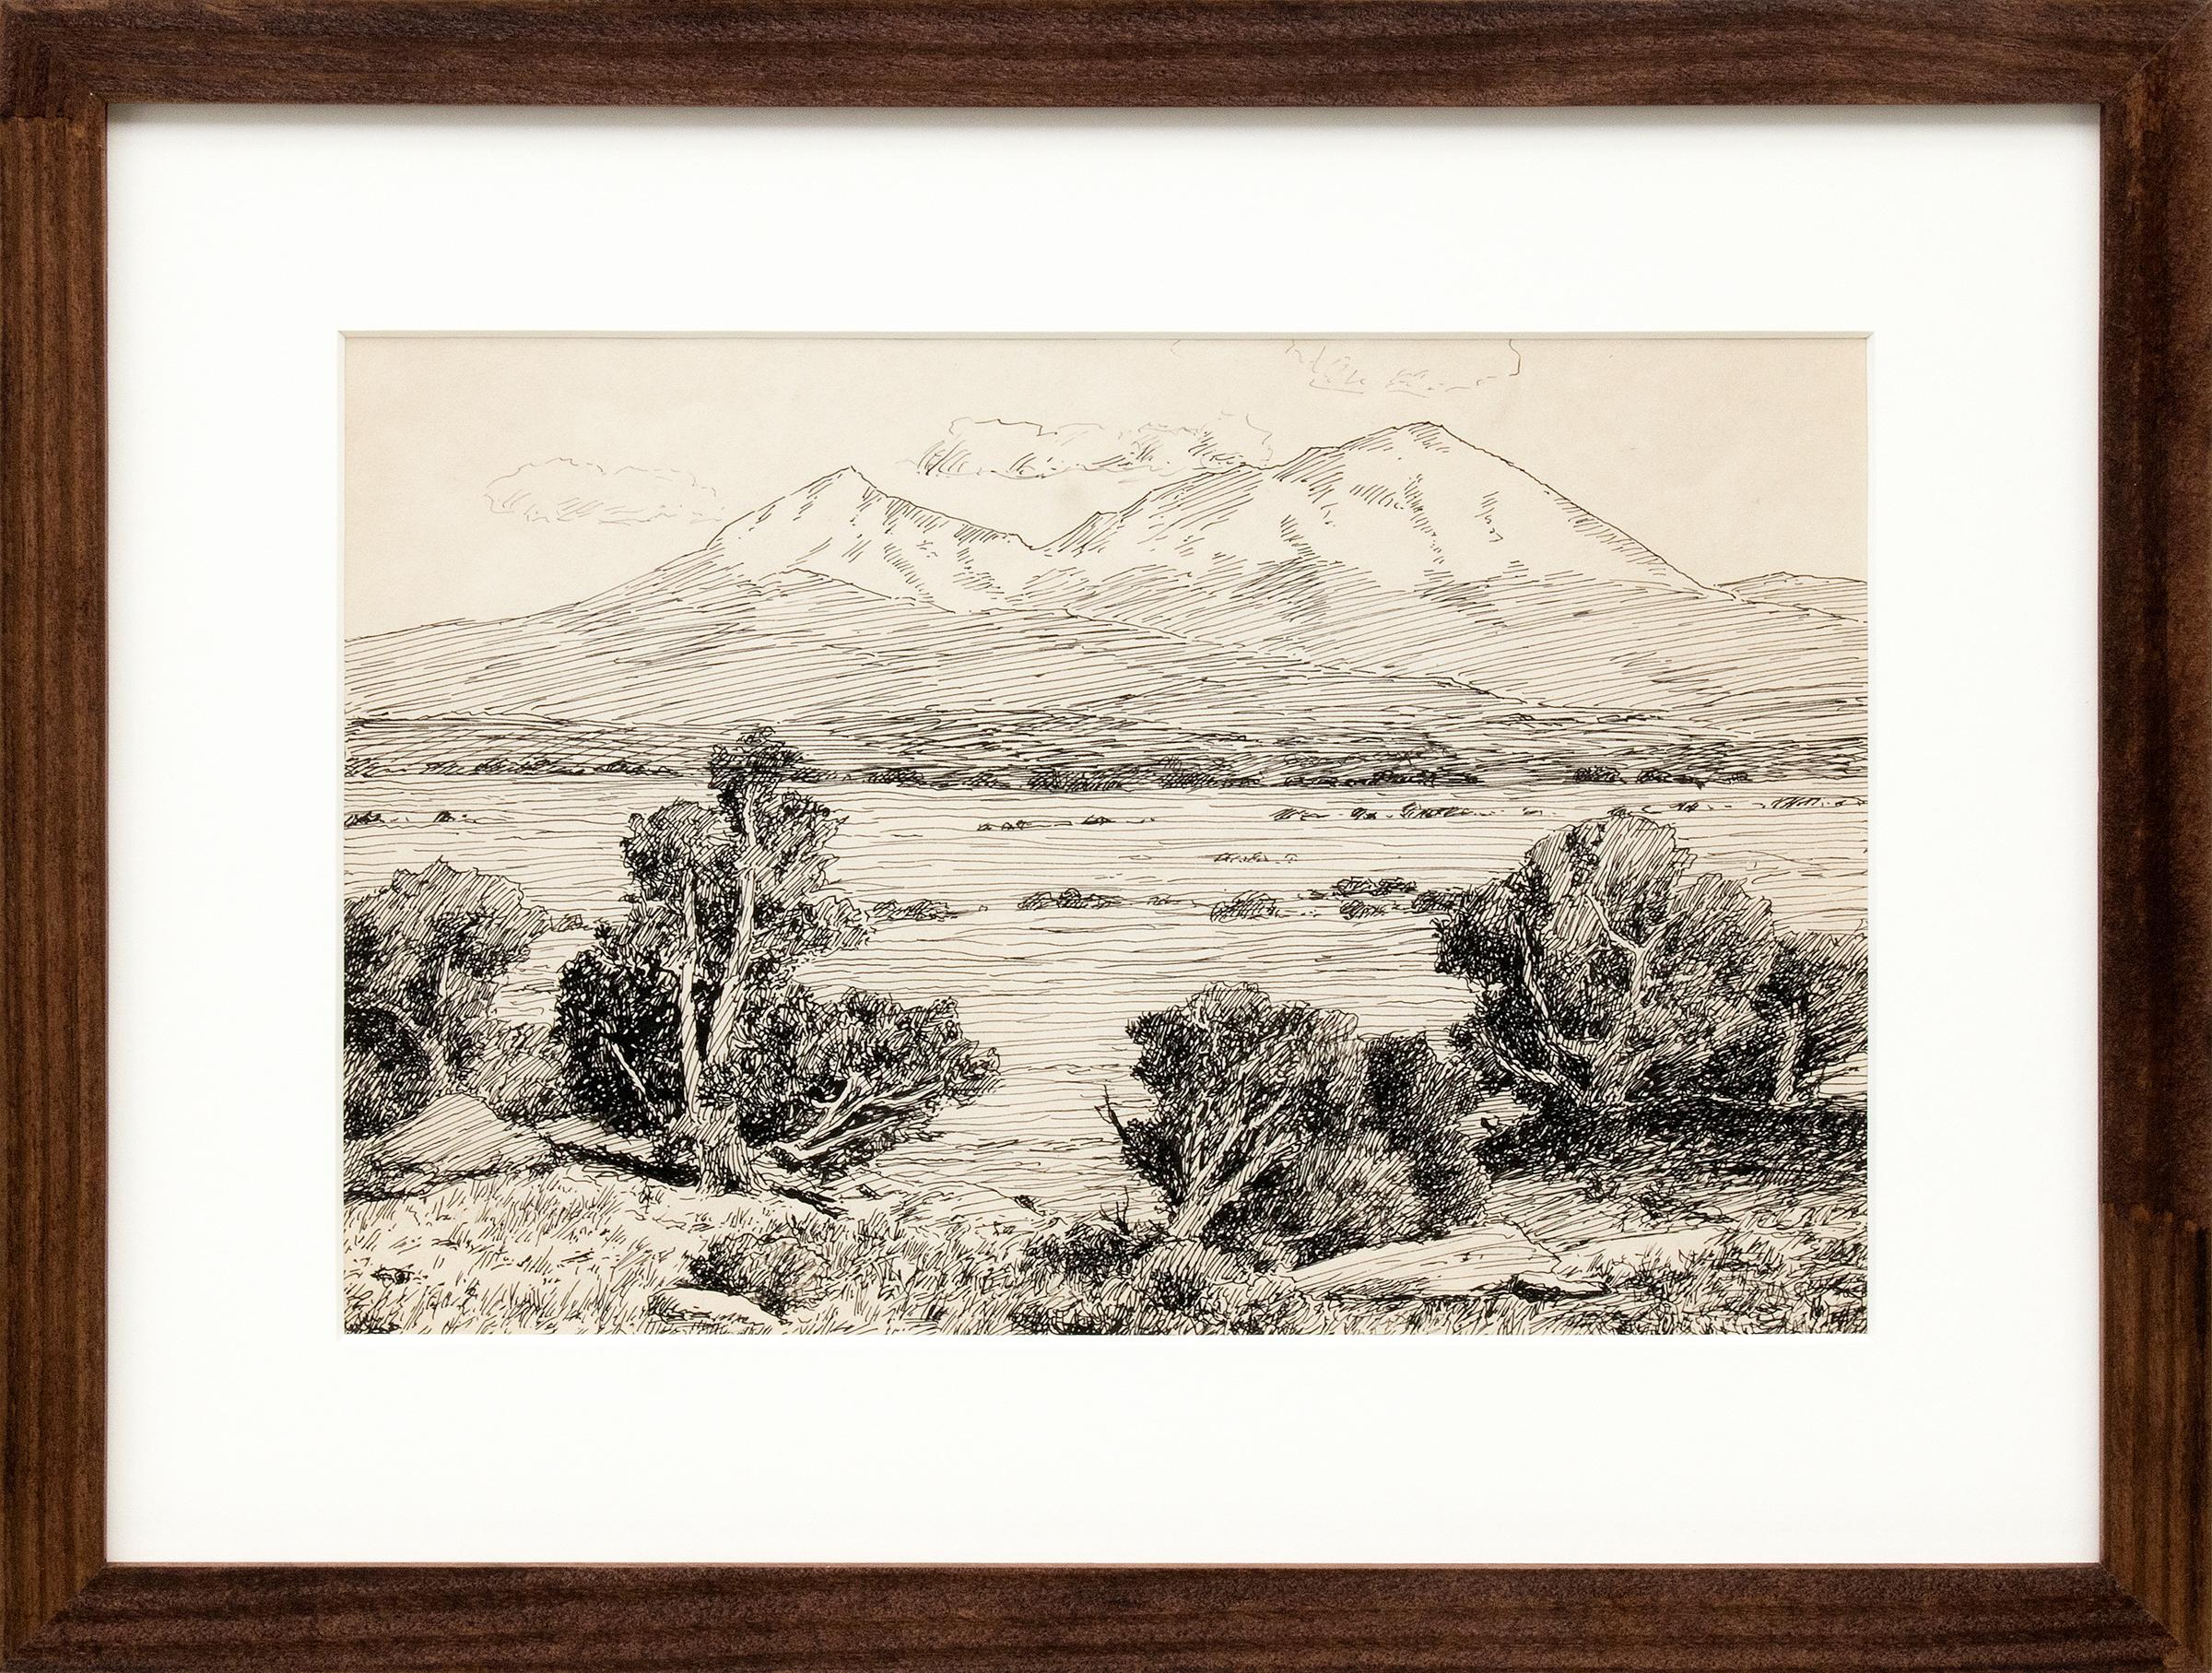 Spanish Peaks, Vintage Colorado Mountain Landscape, Trees, Valley, Black & White